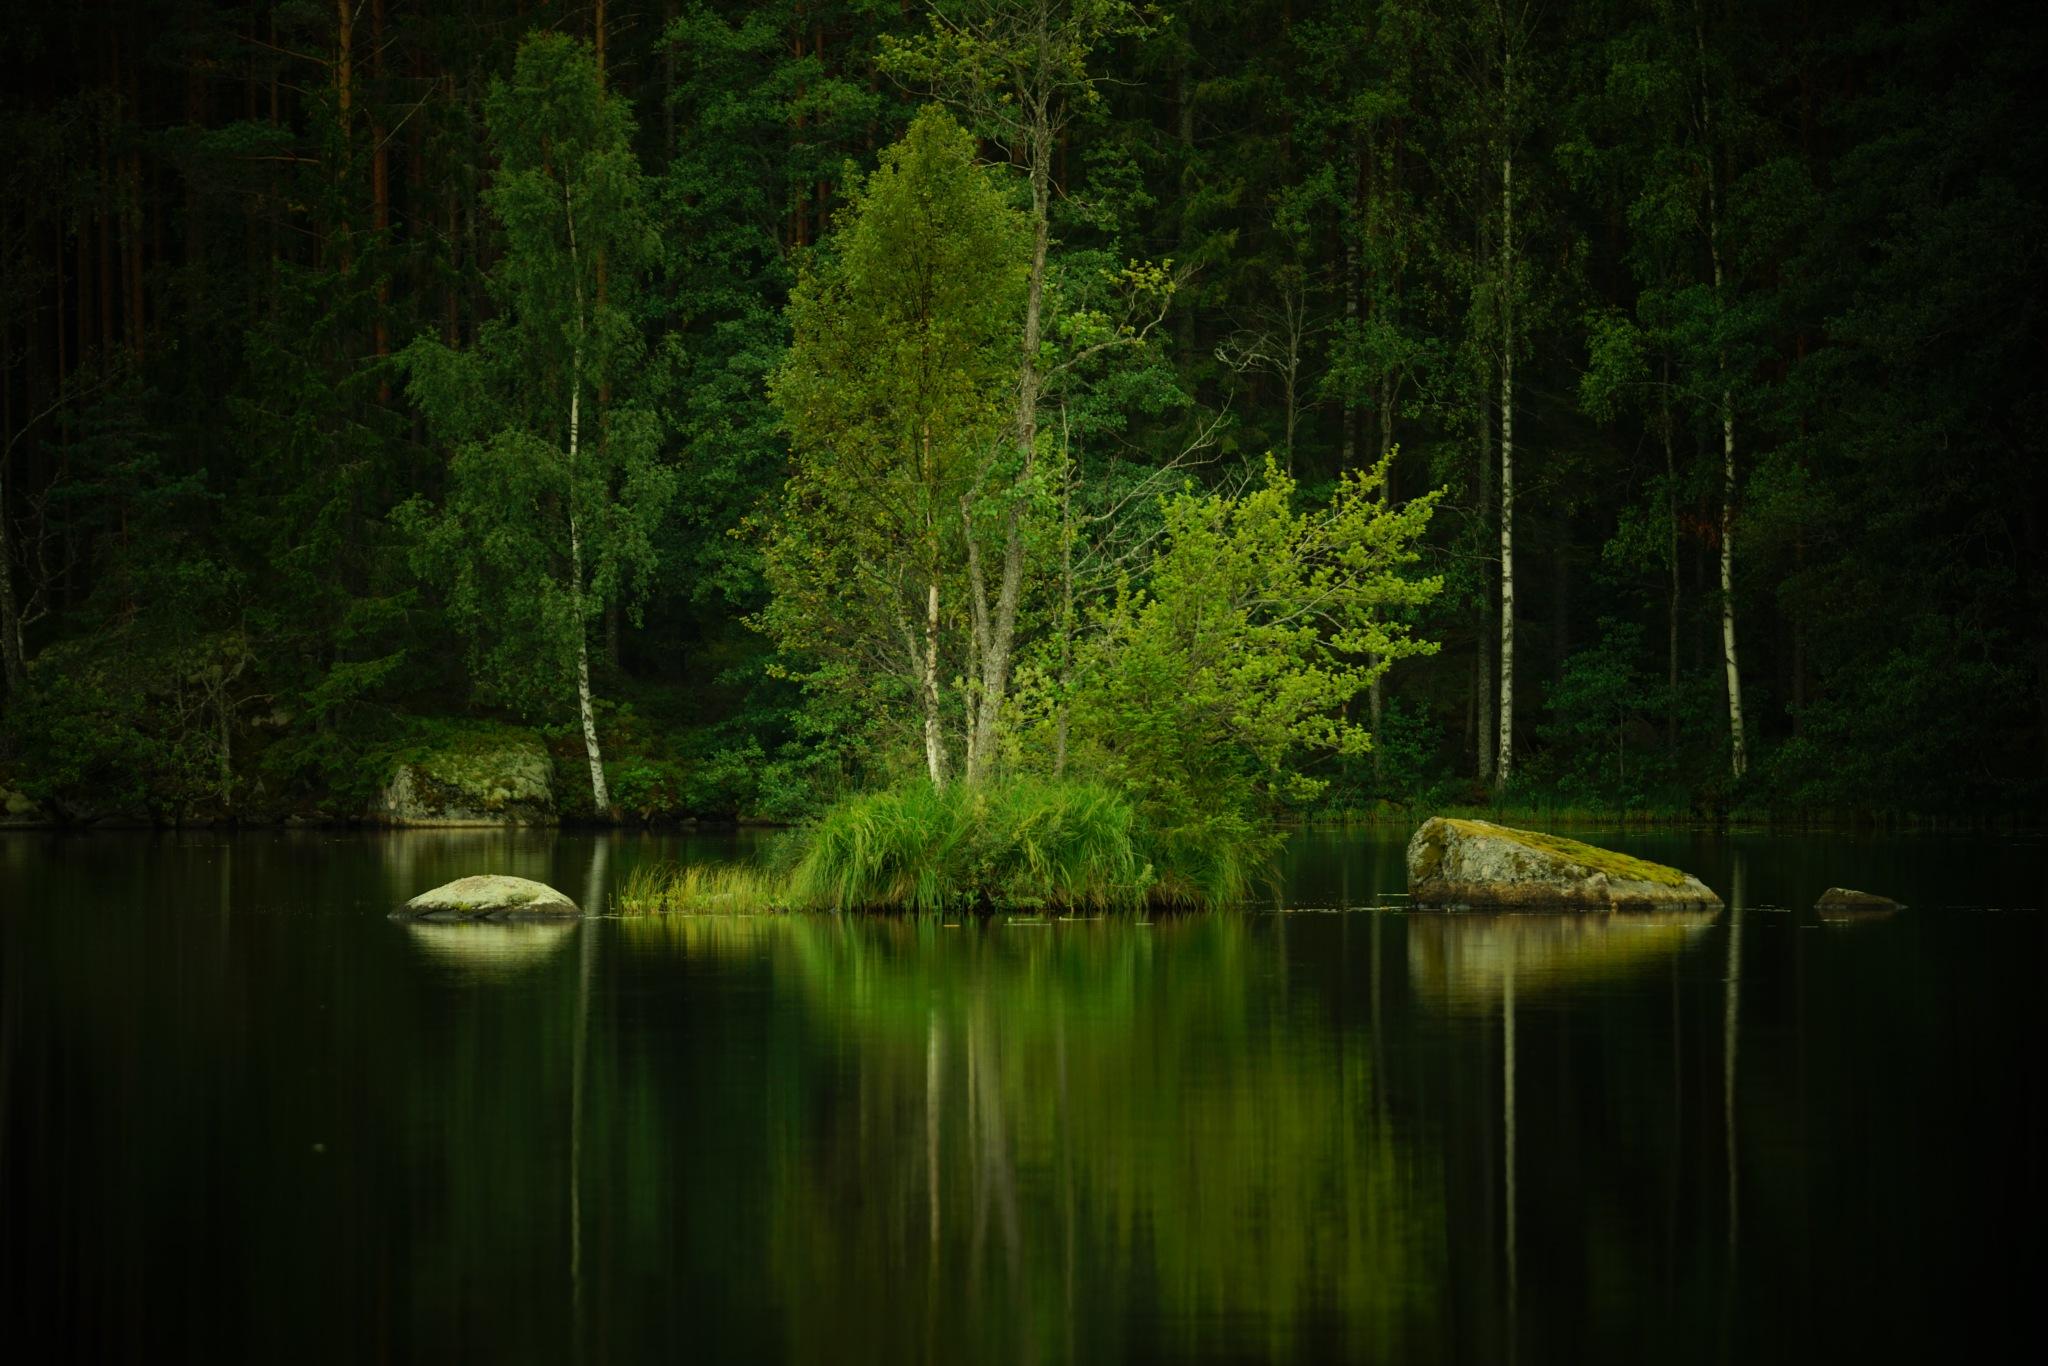 Calm Lake by Andreas Karlsson